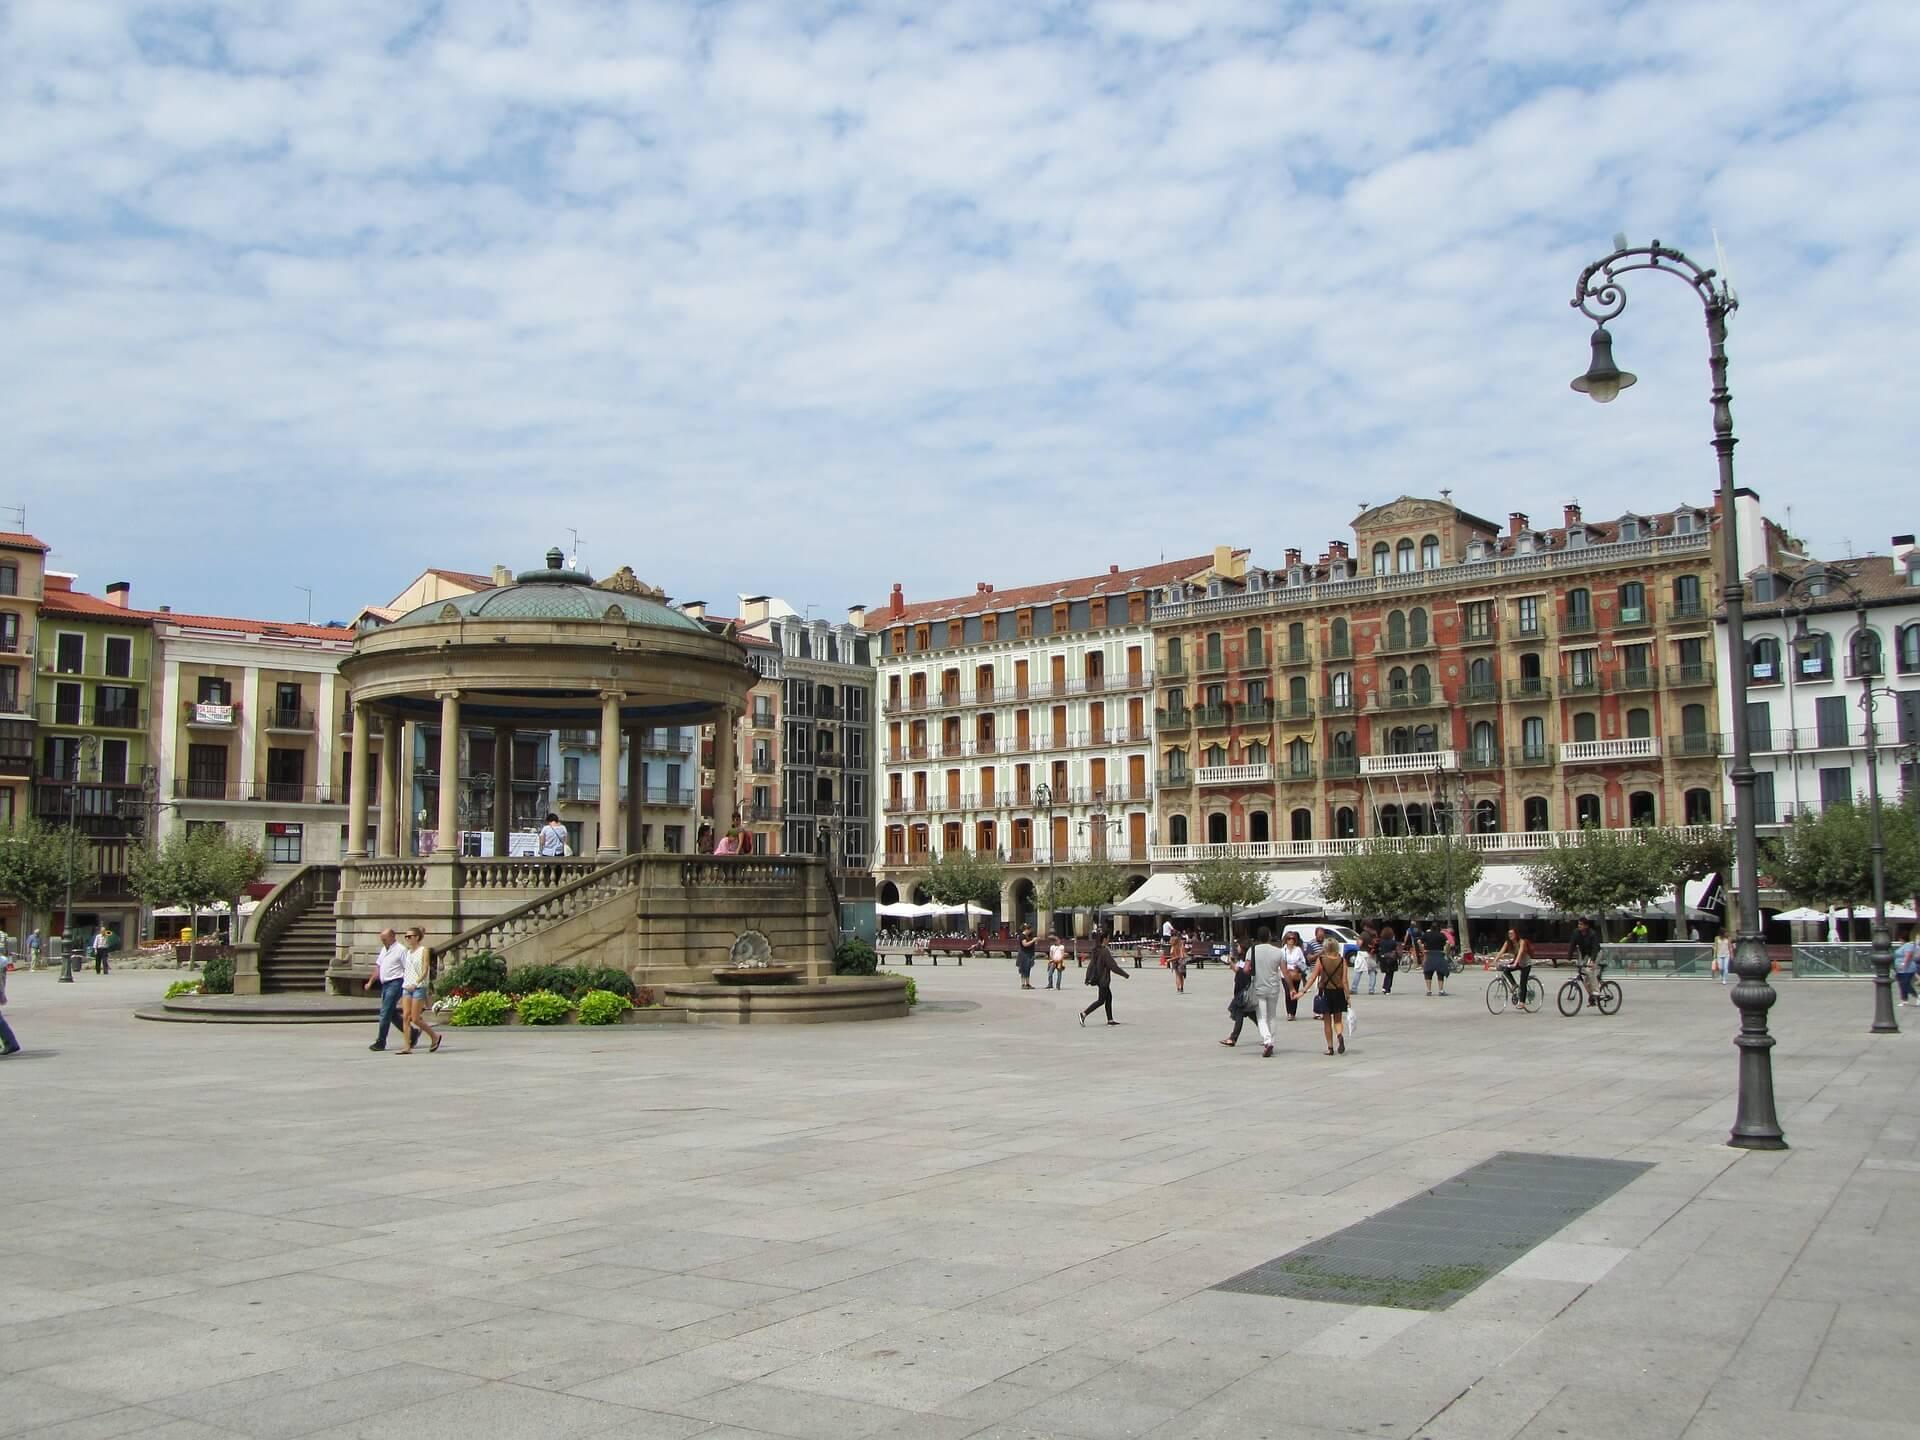 Direktflüge ab Genf nach Bilbao